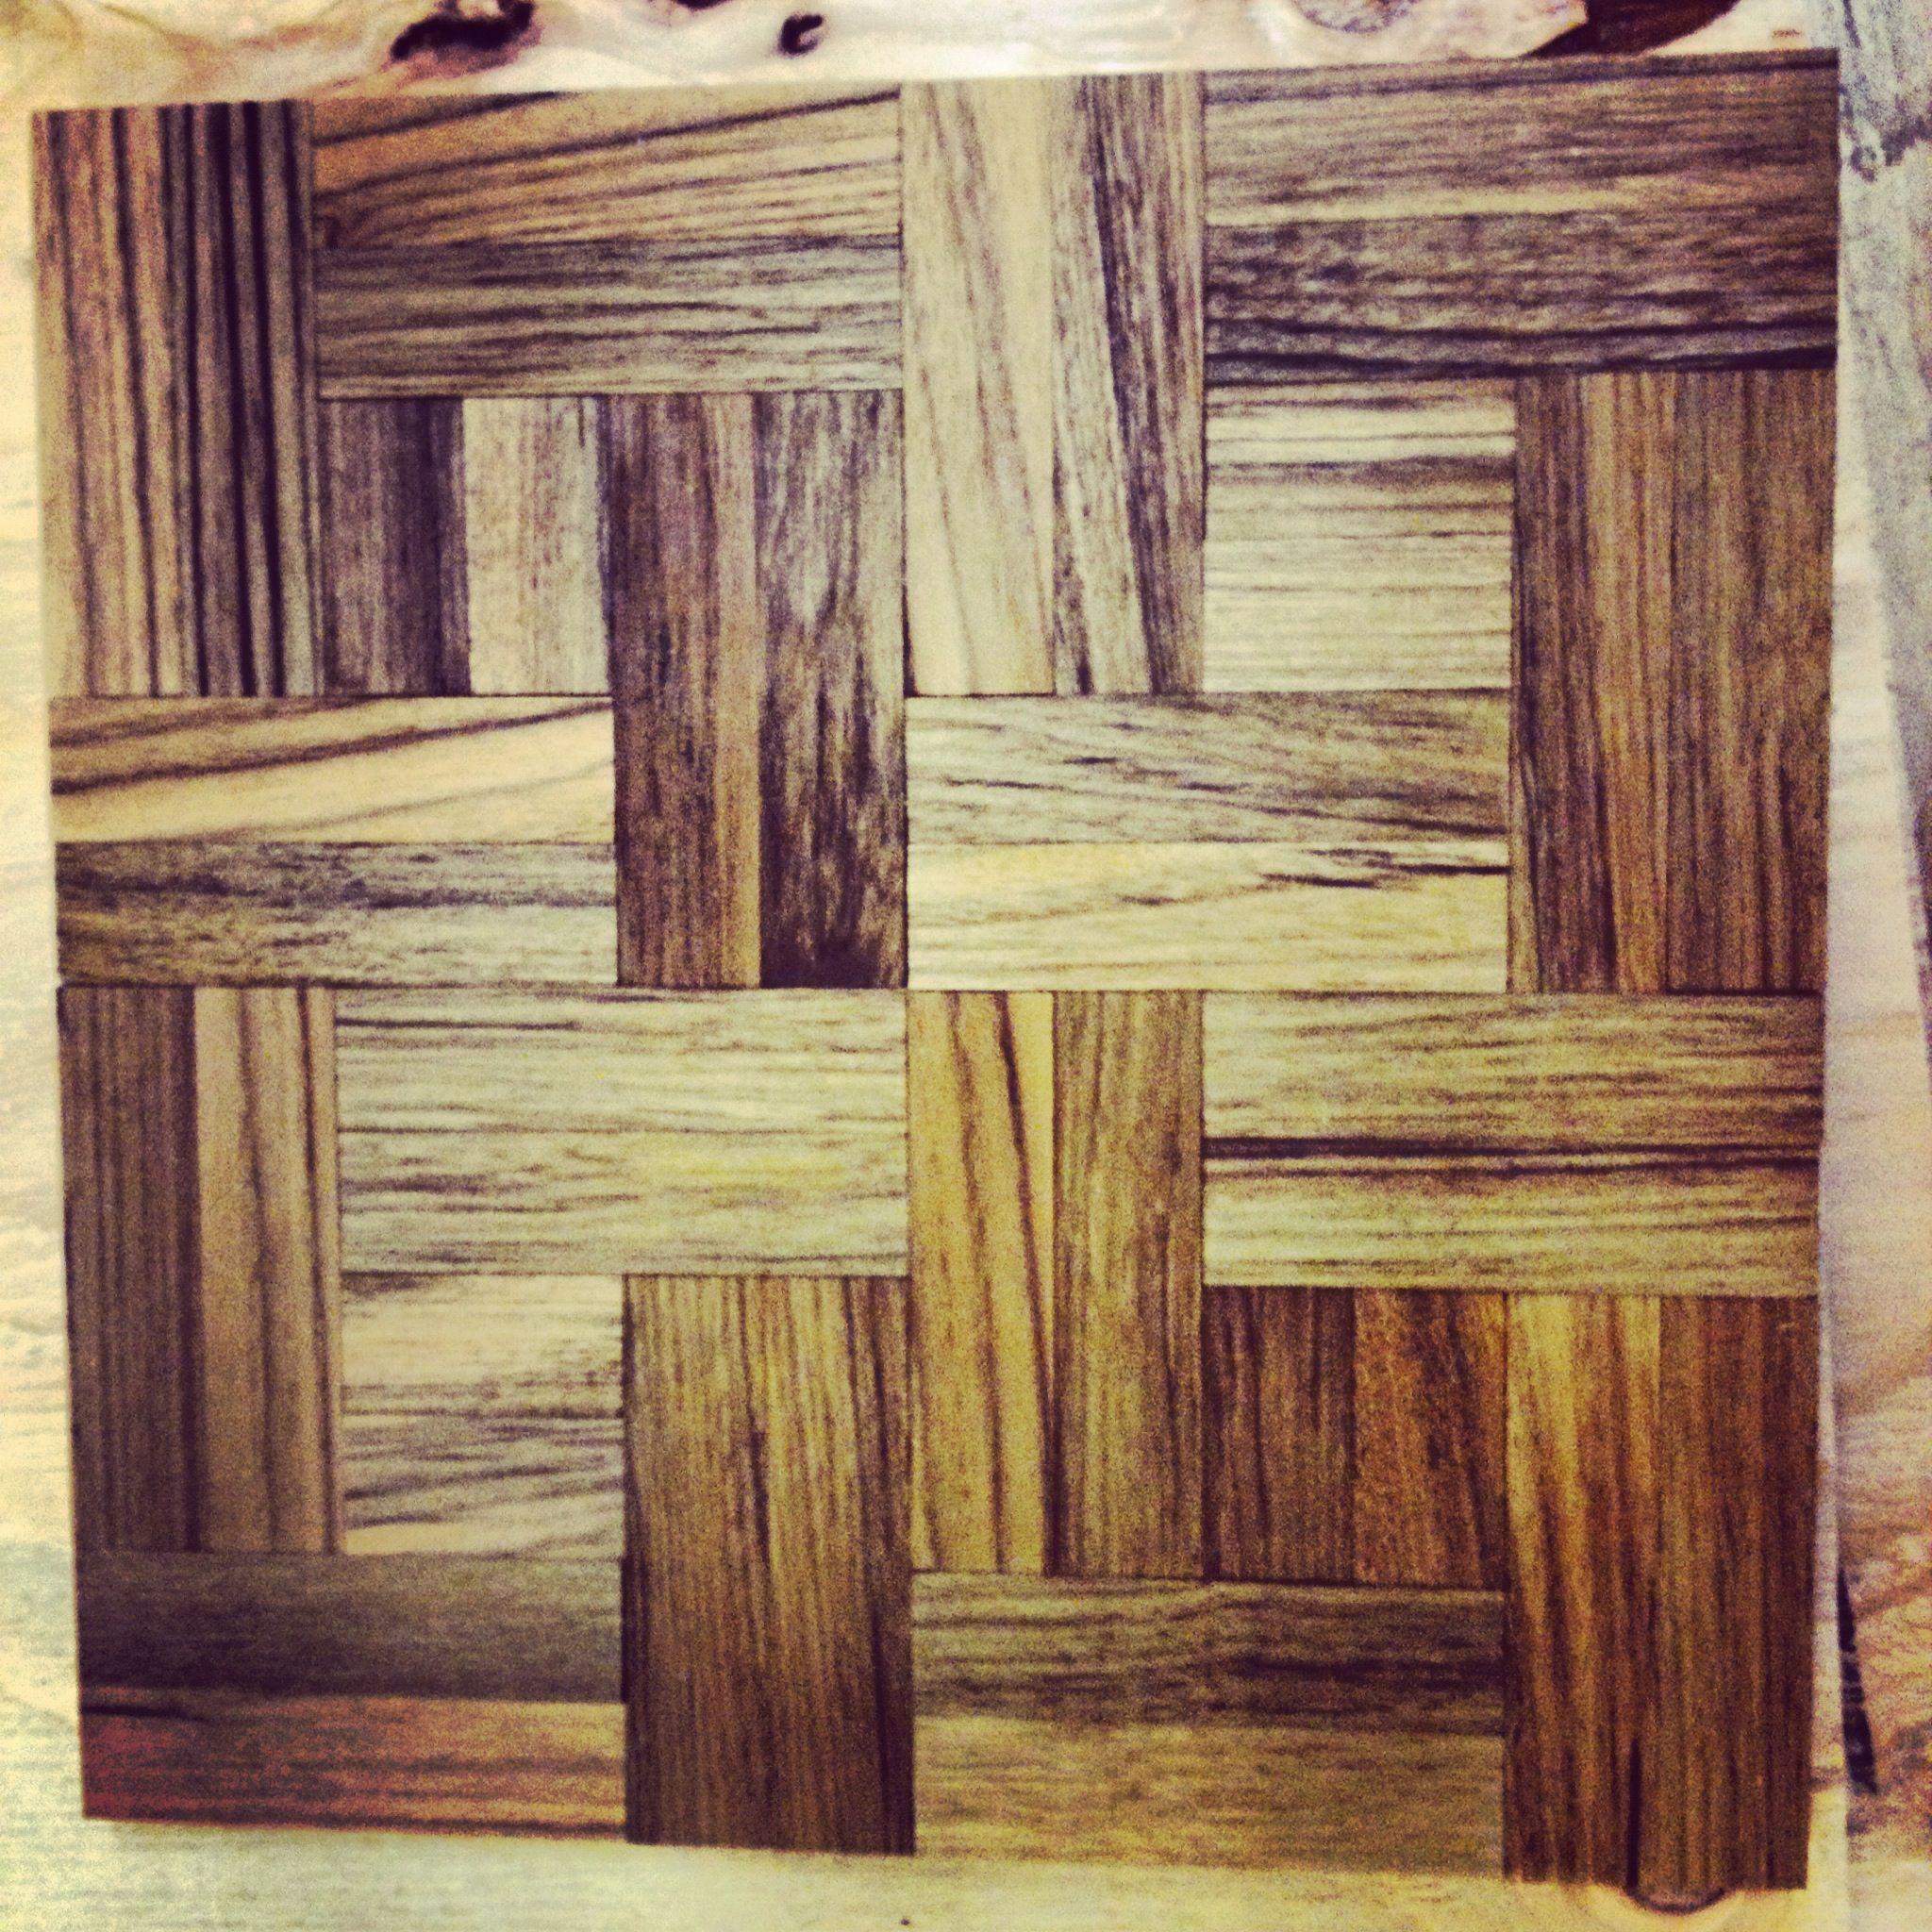 Teak Finger Block Haddon Hall Hardwood Flooring Parquet Hardwood Hardwood Hardwood Floors